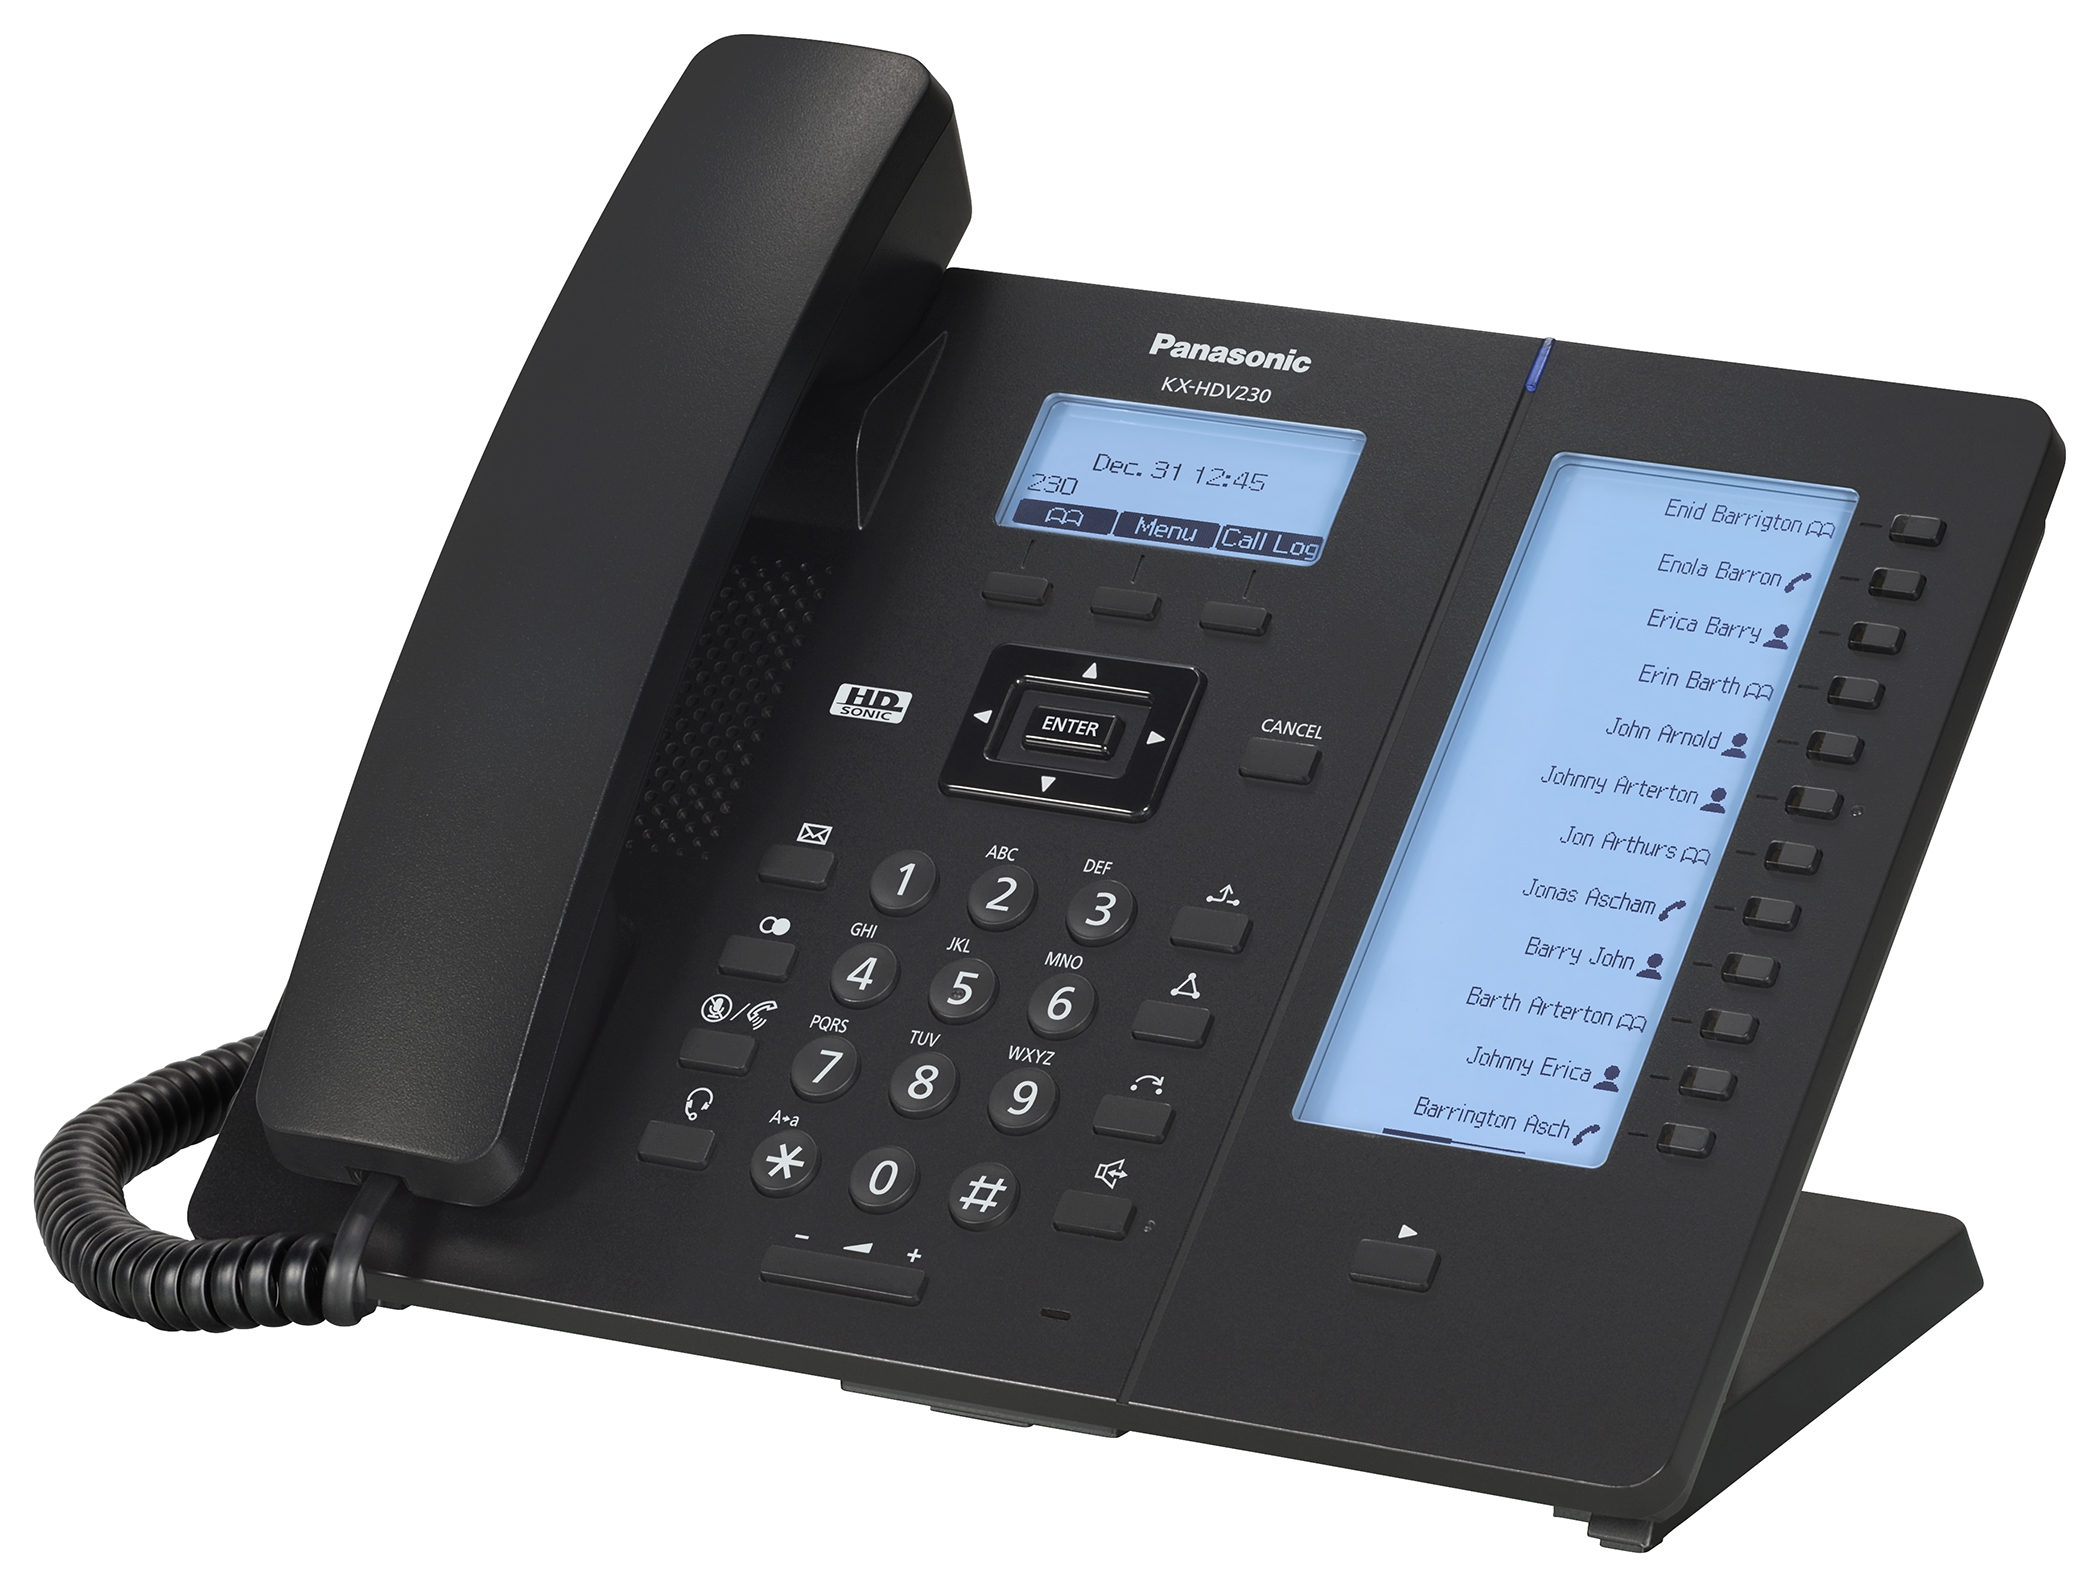 Panasonic - KX-HDV-230, schwarz